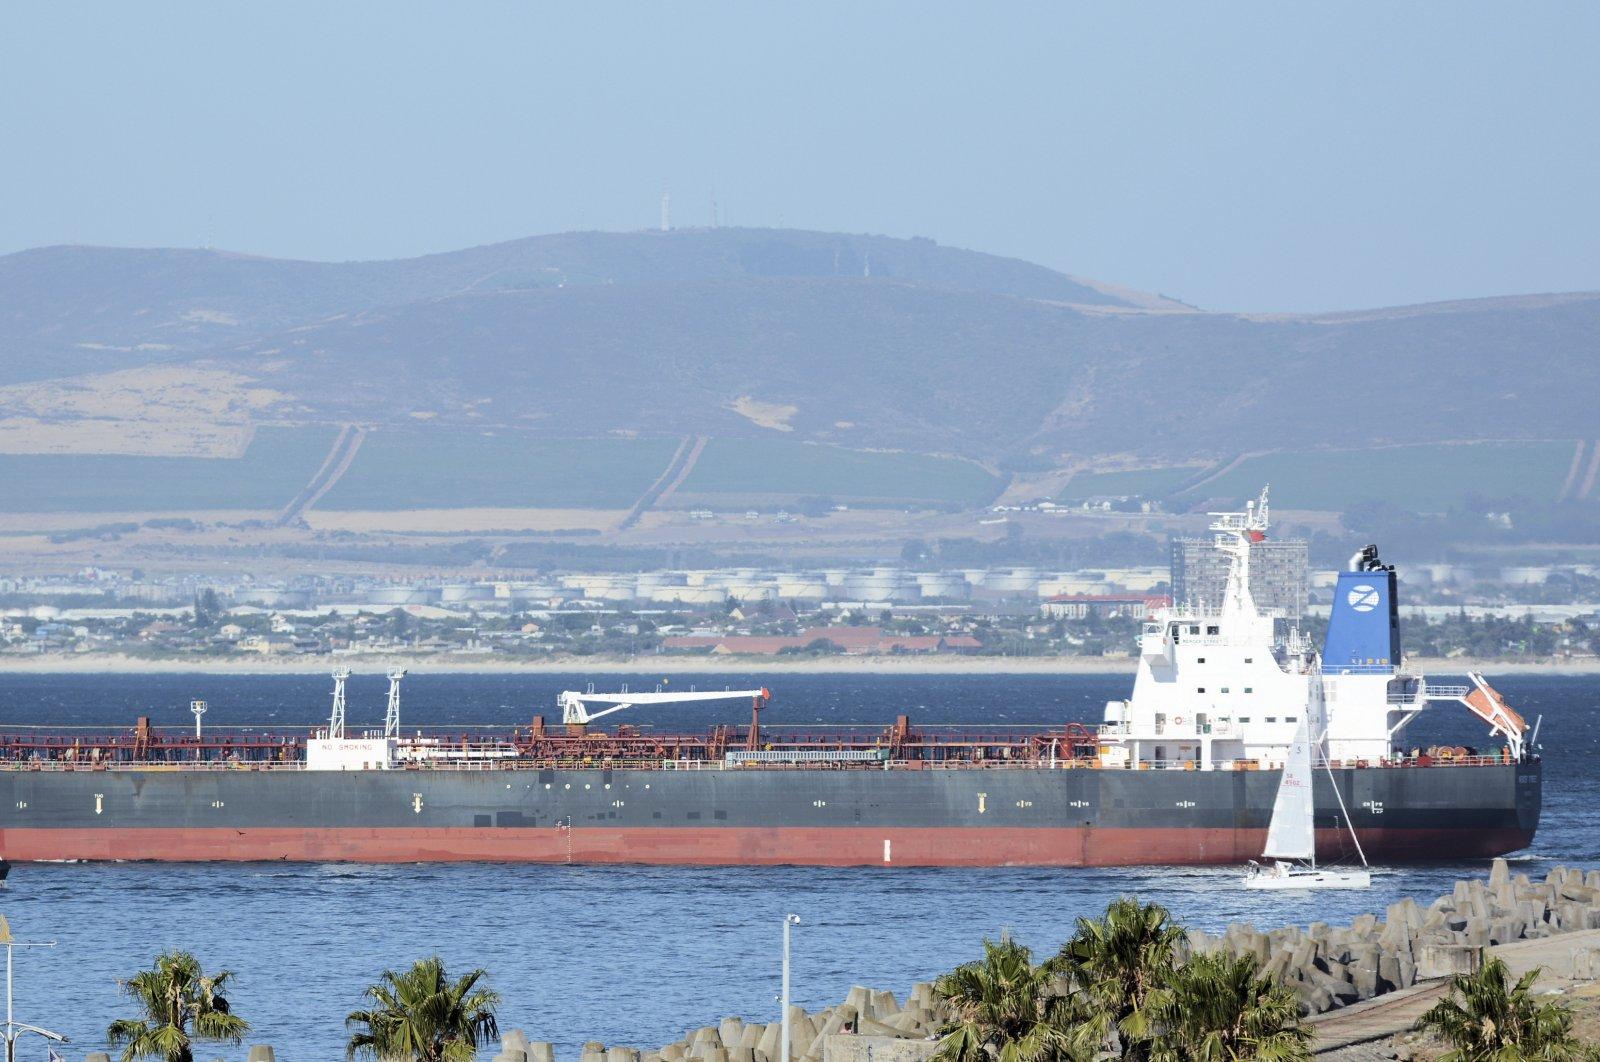 The Liberian-flagged oil tanker Mercer Street seen off Cape Town, South Africa, Jan. 2, 2016. (Johan Victor via AP)